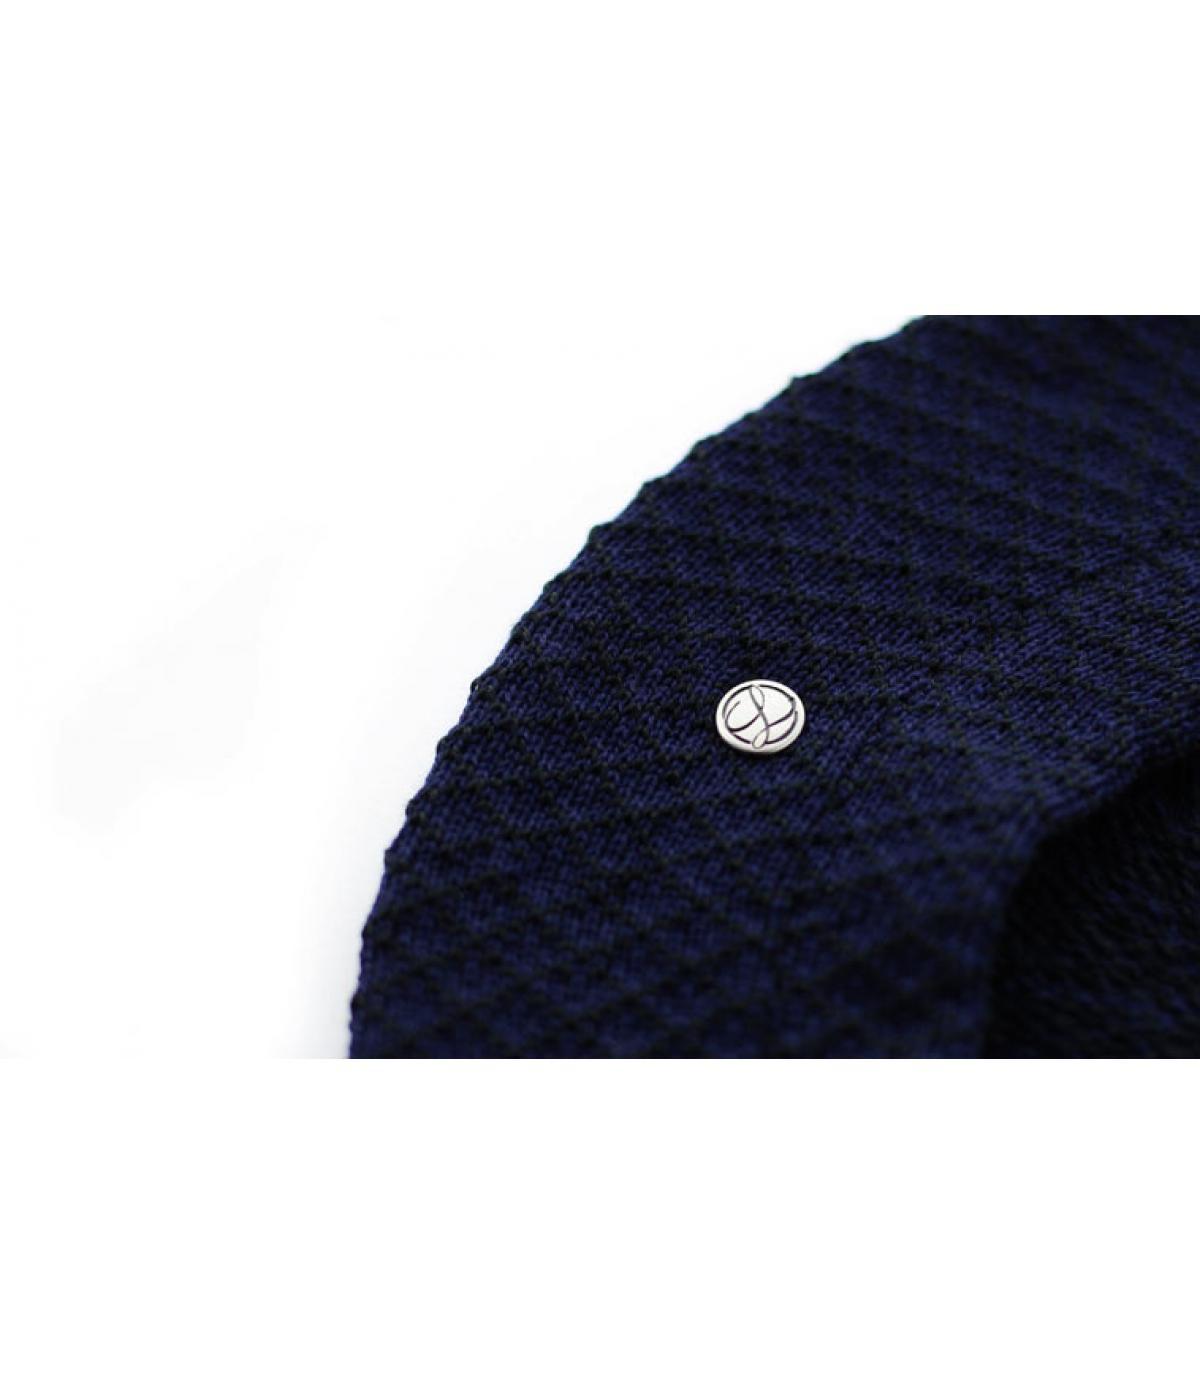 Dettagli Béret Cotton midnight - image 3